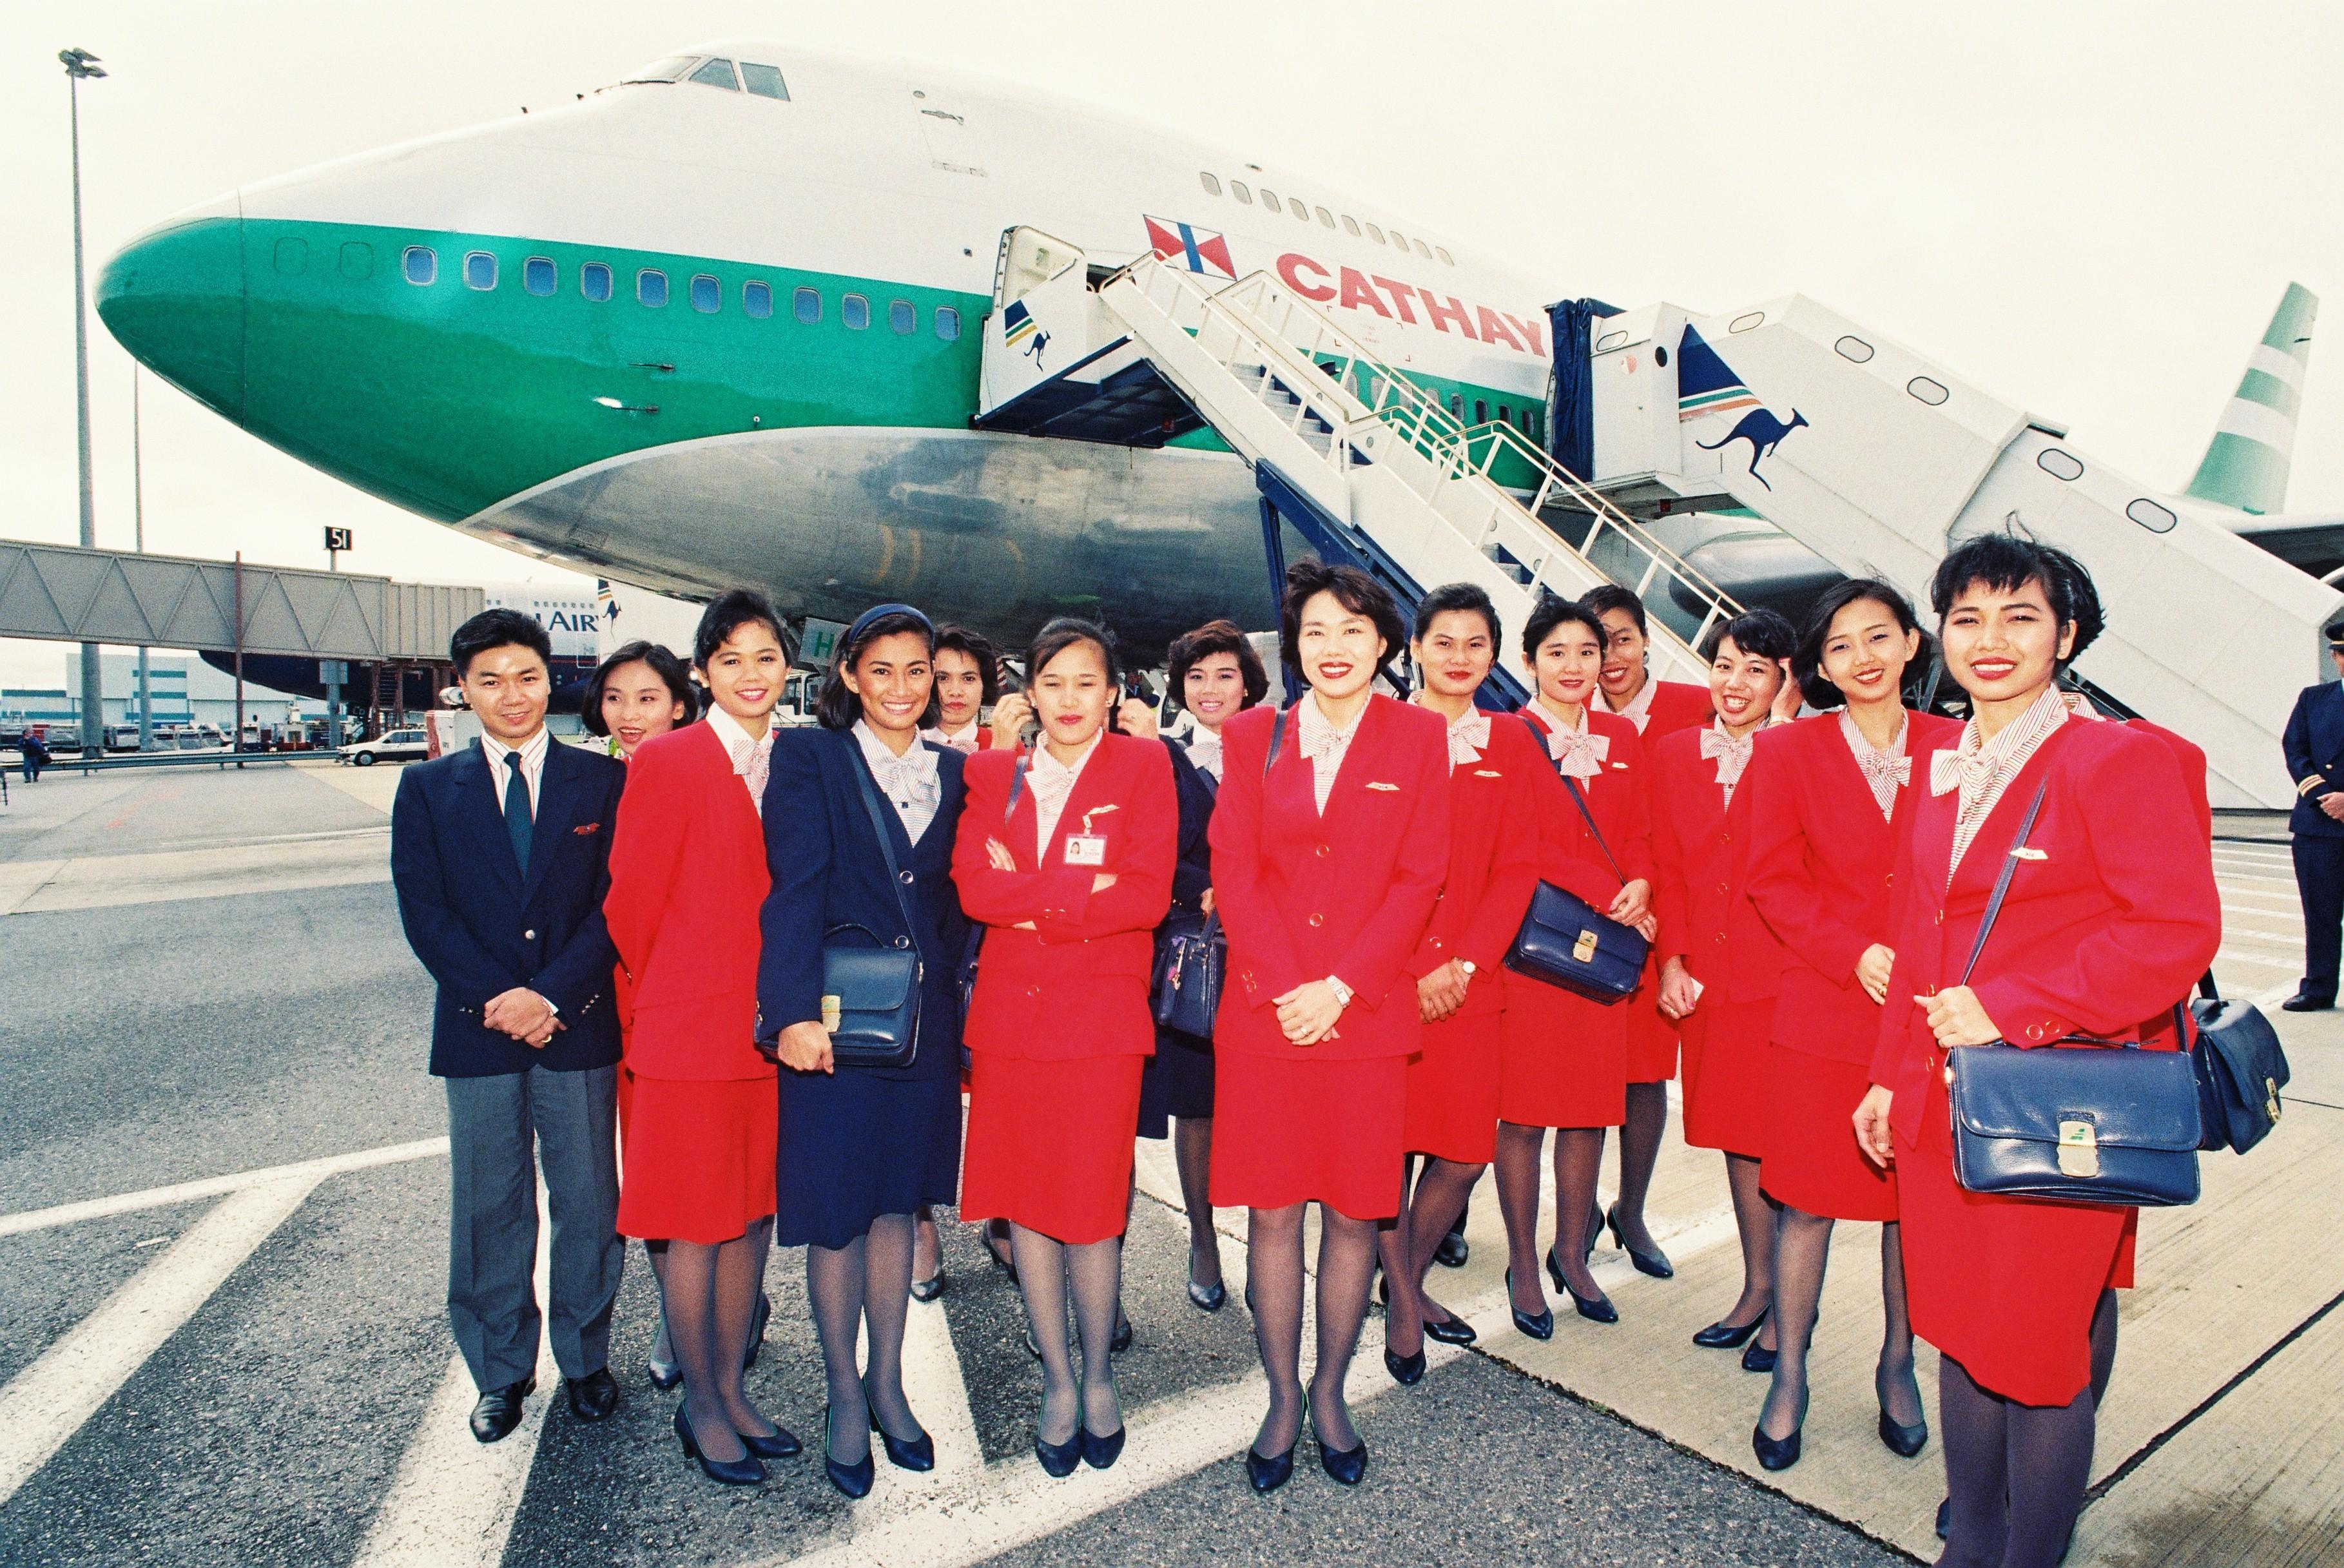 Cabin crew inaugural flights[2][1]